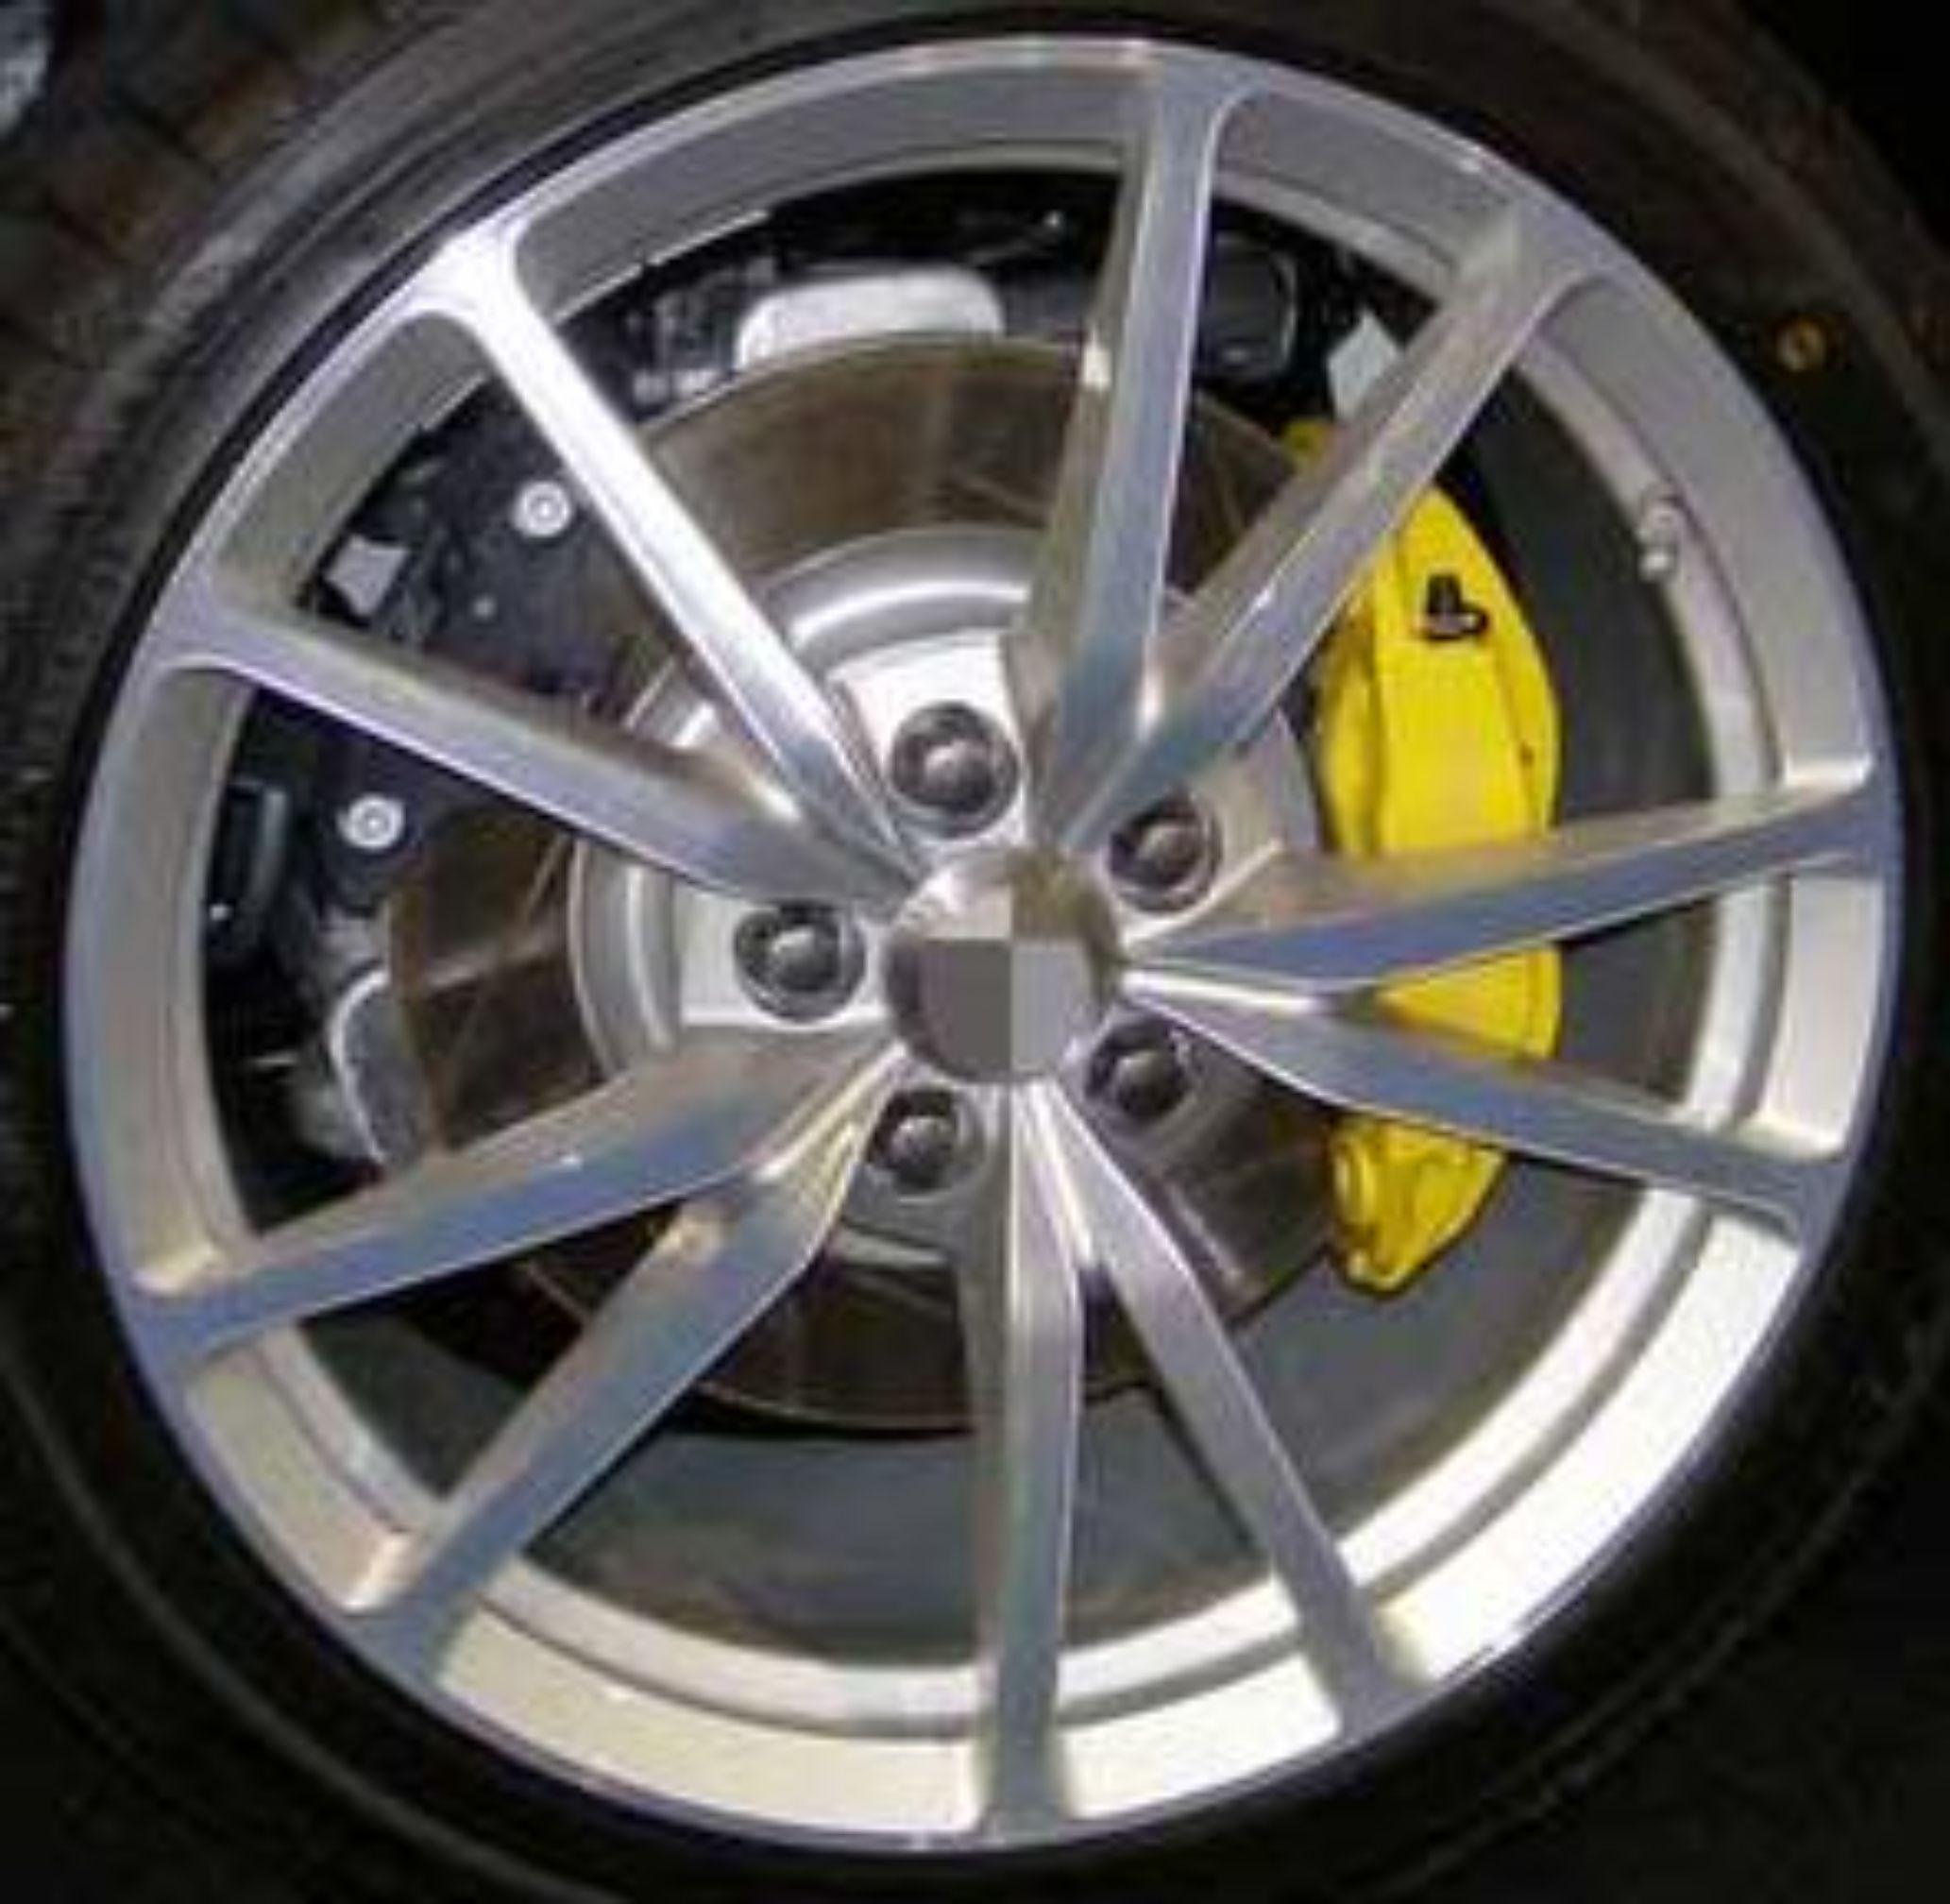 OEM FORGED WHEELS for Aston Martin Vantage